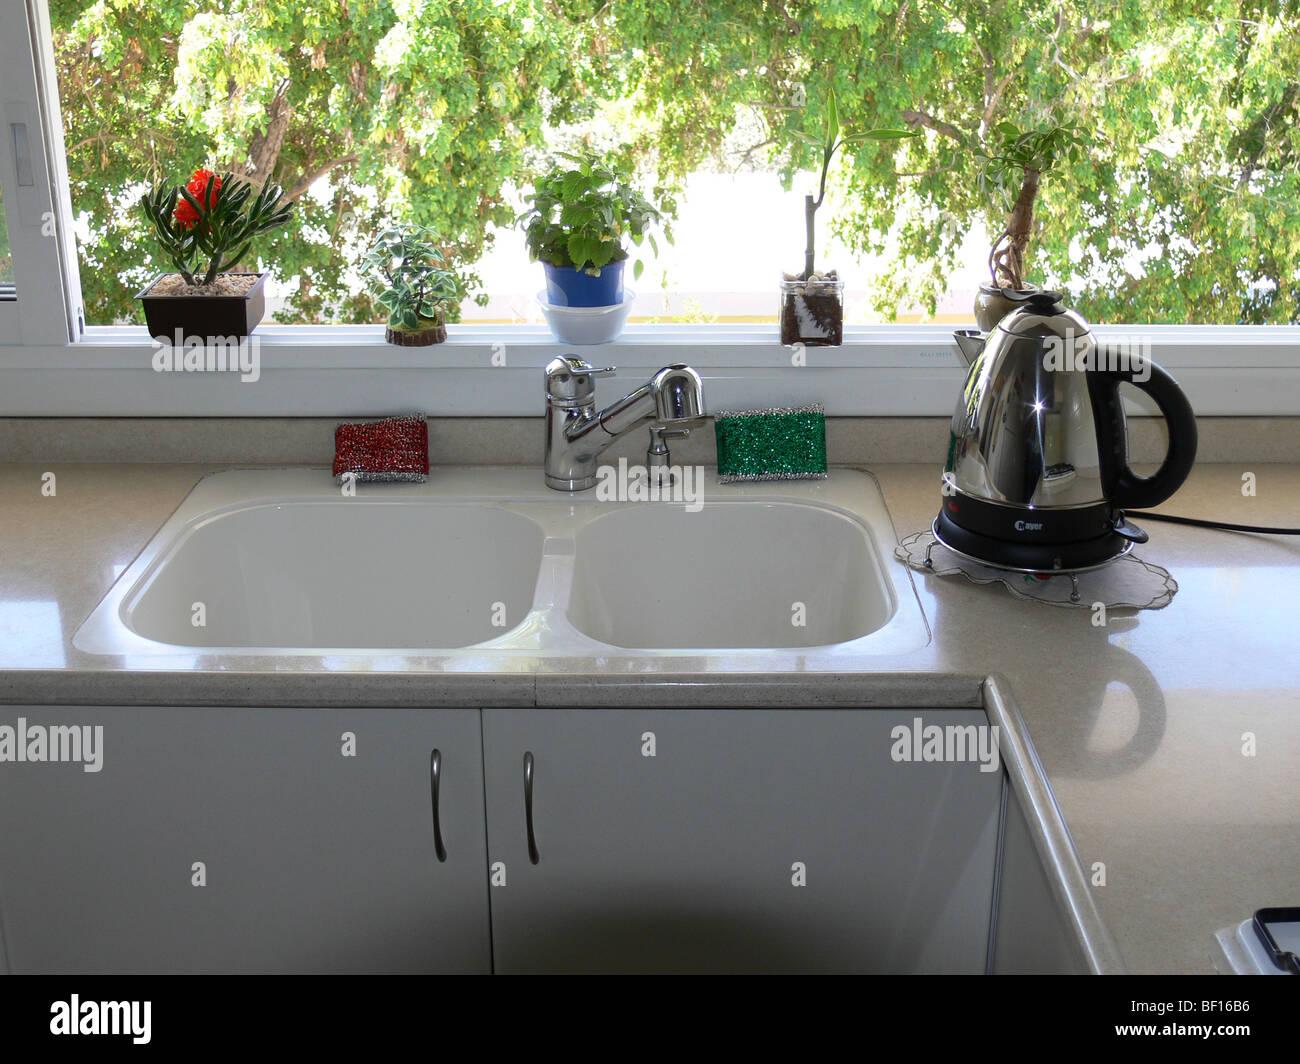 Double Sink Stockfotos & Double Sink Bilder - Alamy